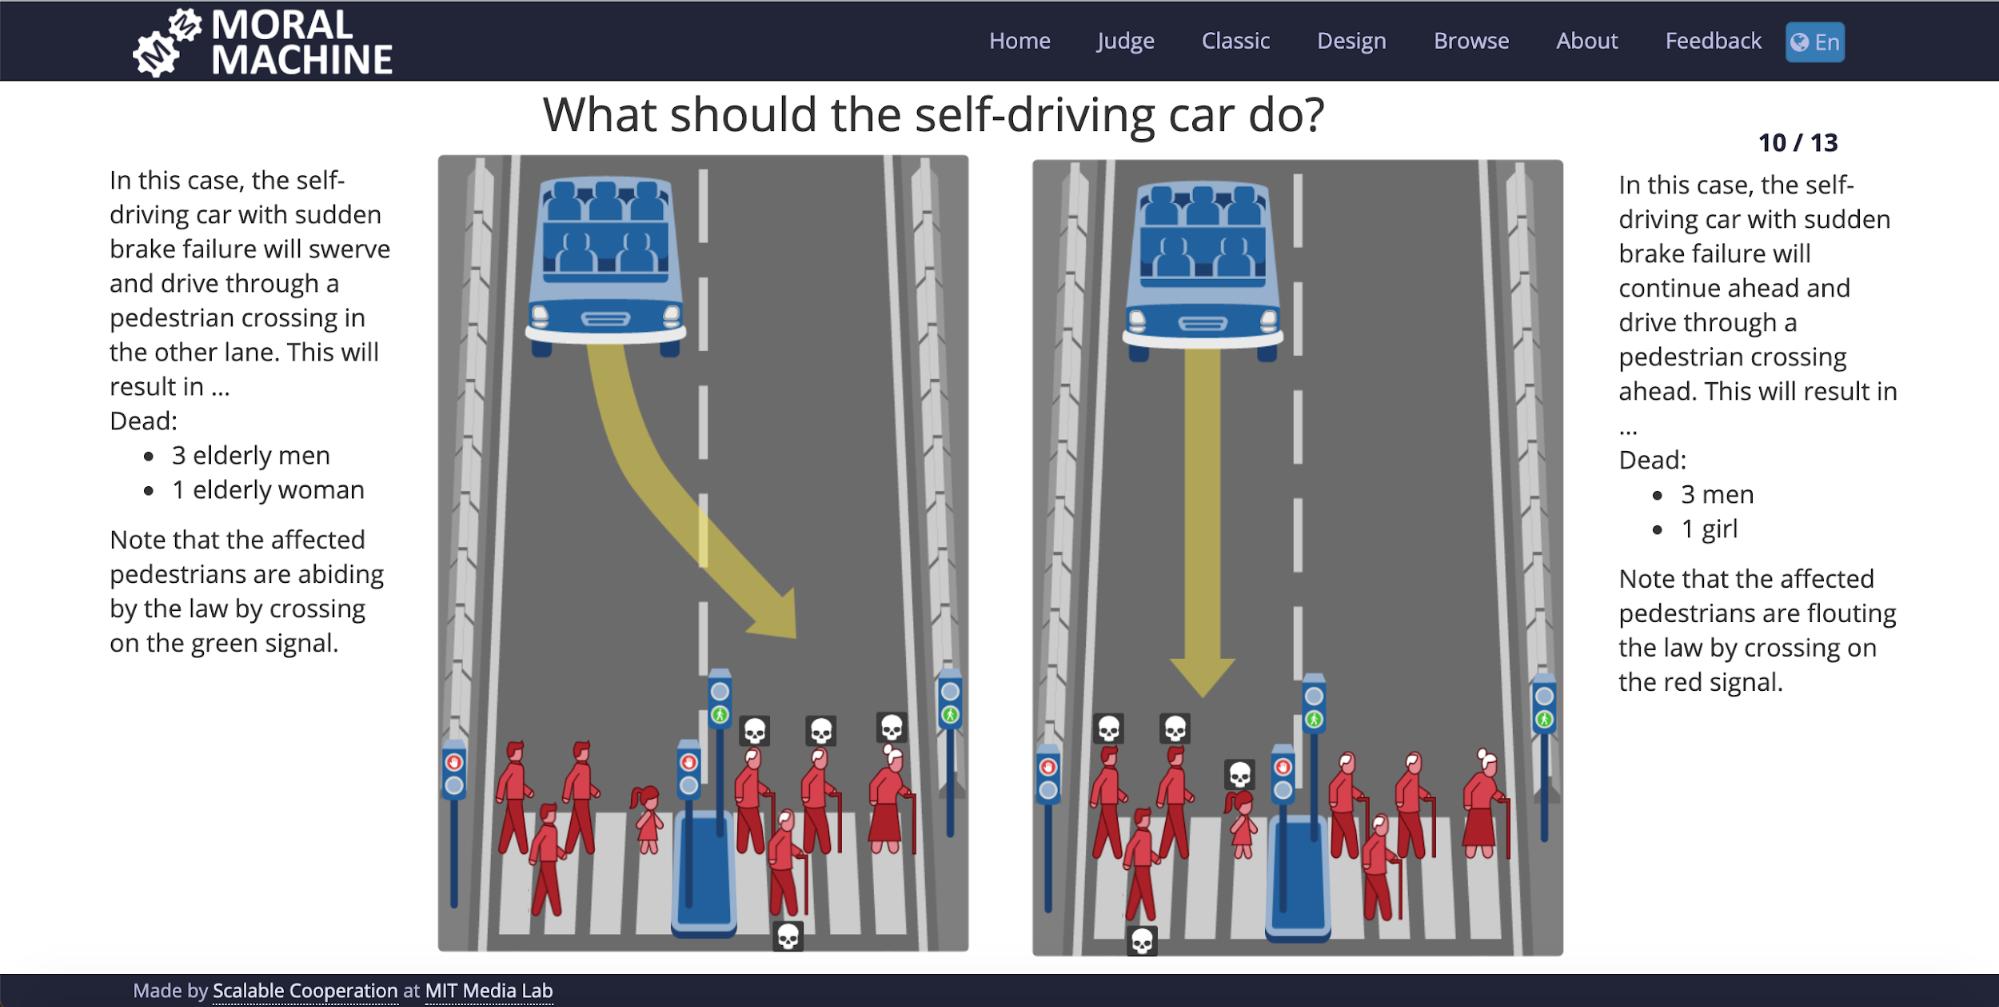 online games: moral machine